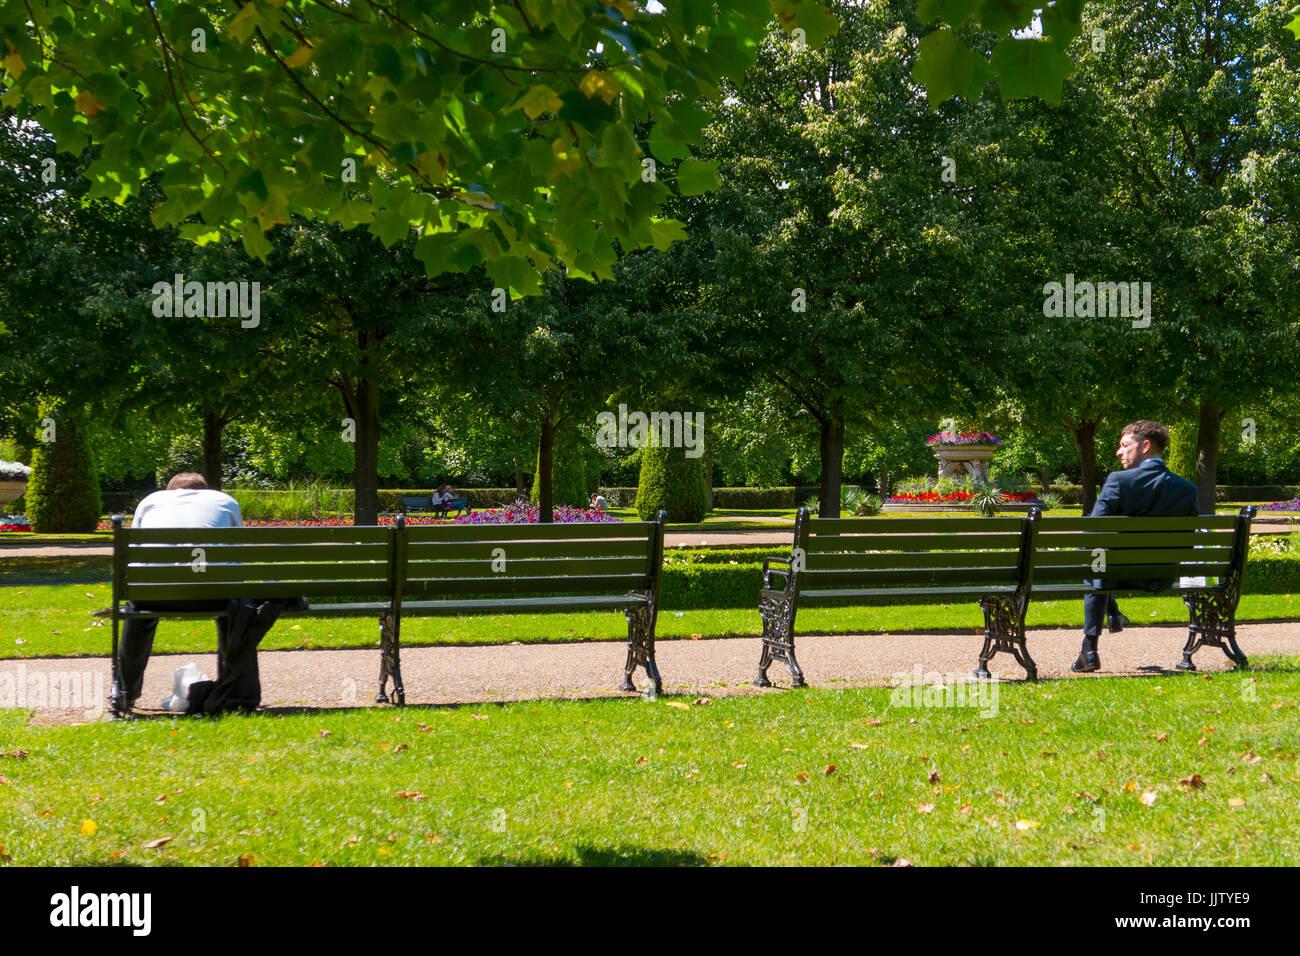 men sit on parks benches summer in the regent 39 s park london stock photo 149295169 alamy. Black Bedroom Furniture Sets. Home Design Ideas